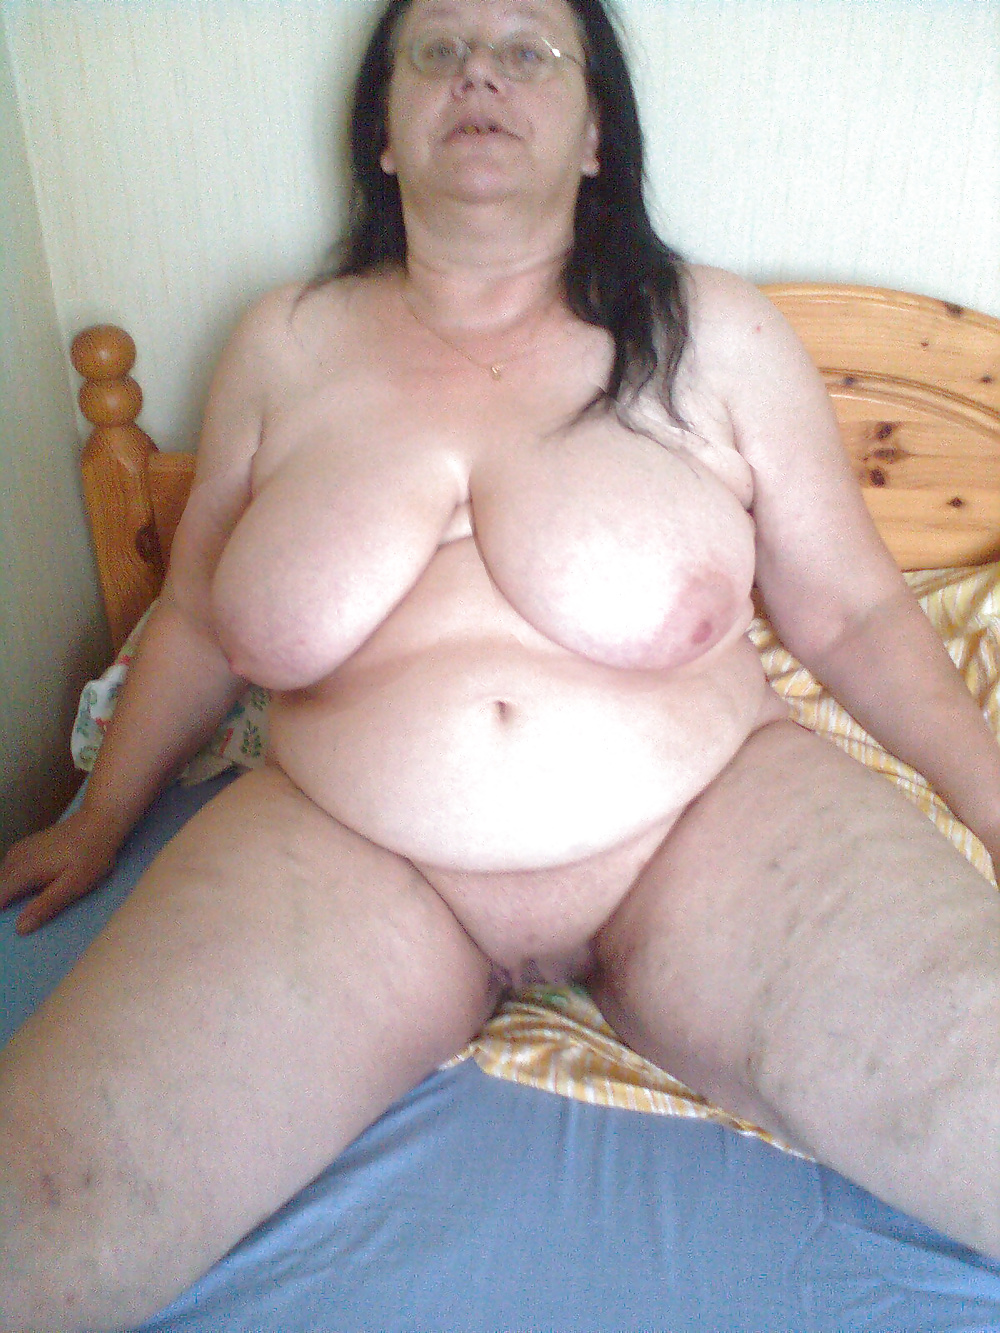 Junger und alter nackter Körper - Bild 10